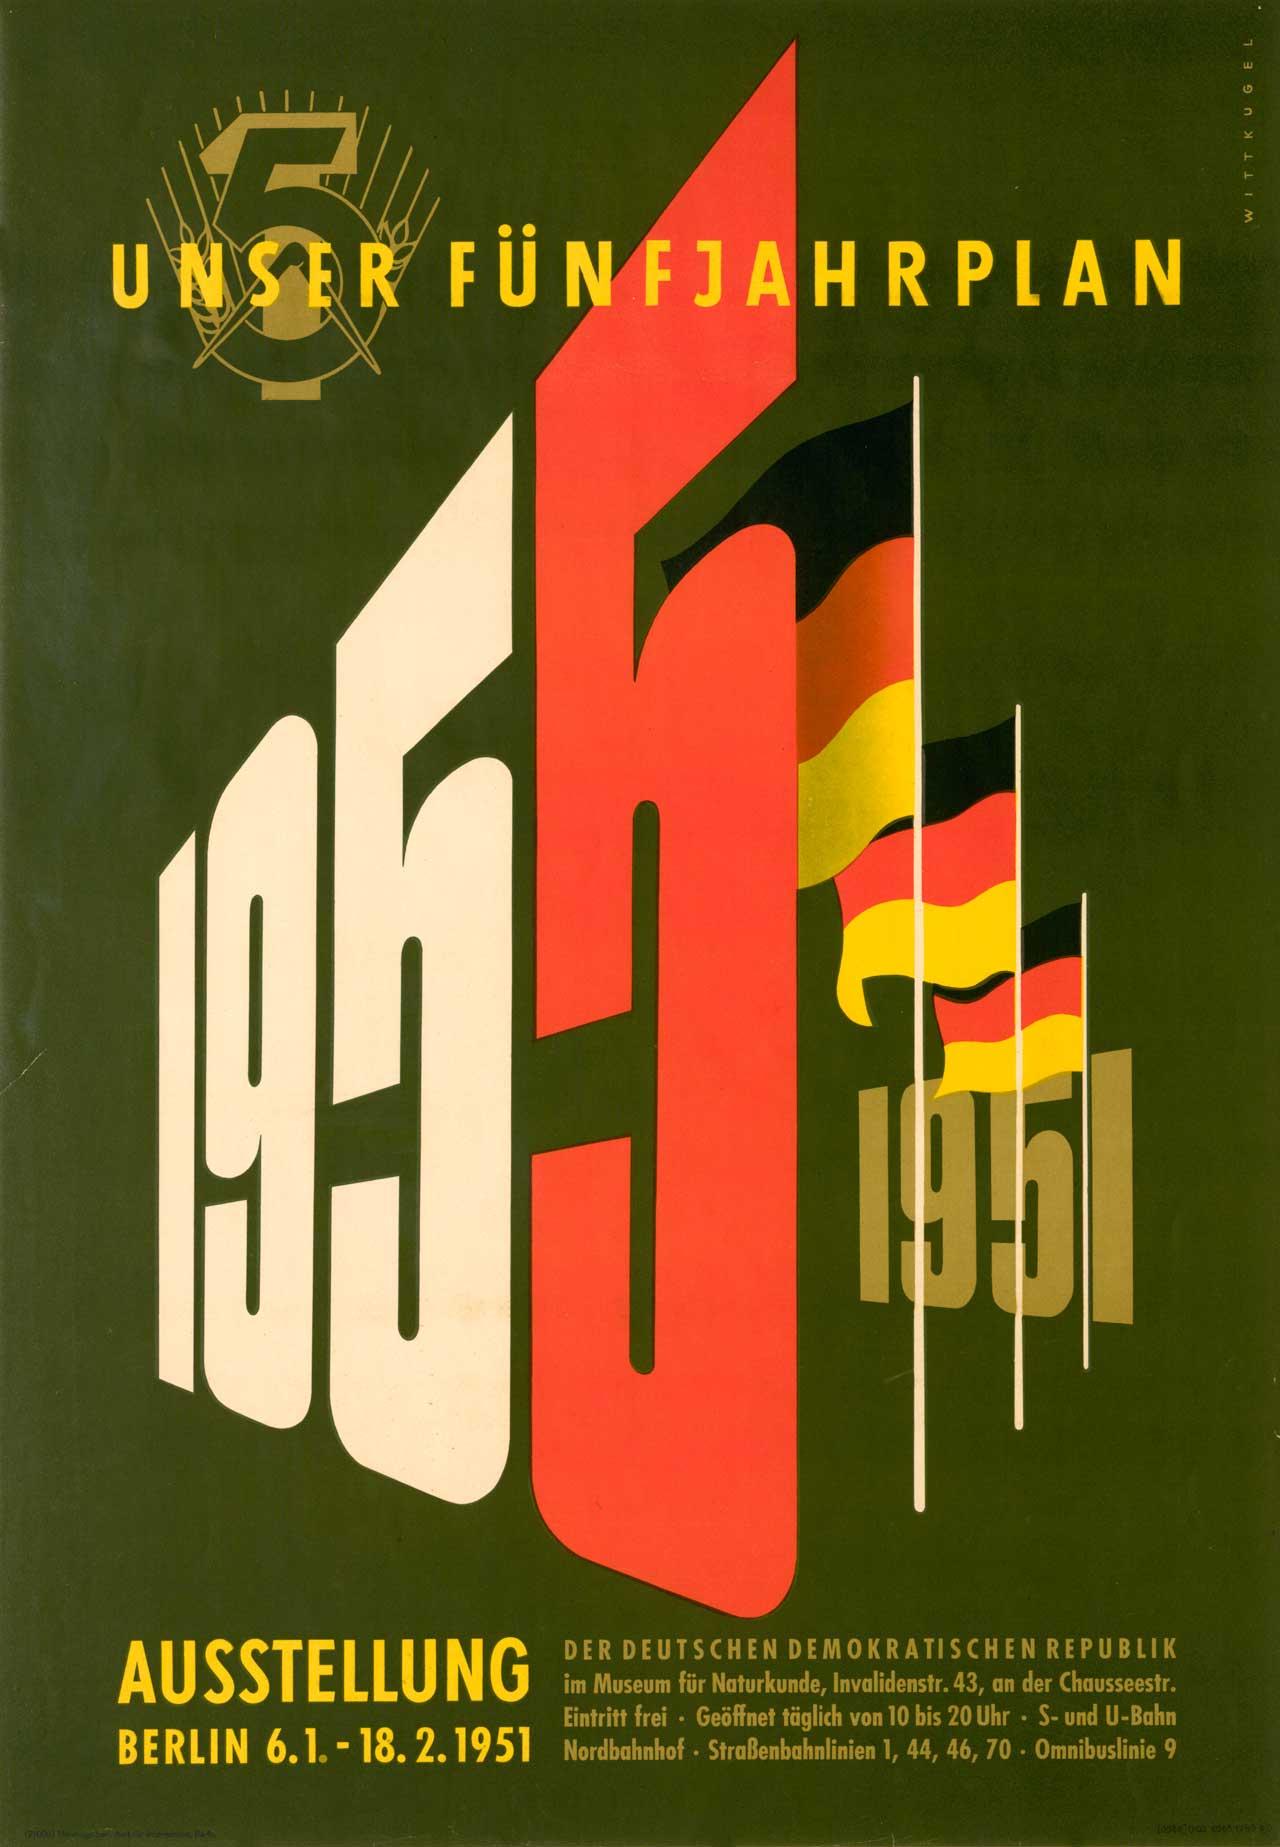 aiga-design-Wittkugel-1950-Fuenfjahrplan.jpg